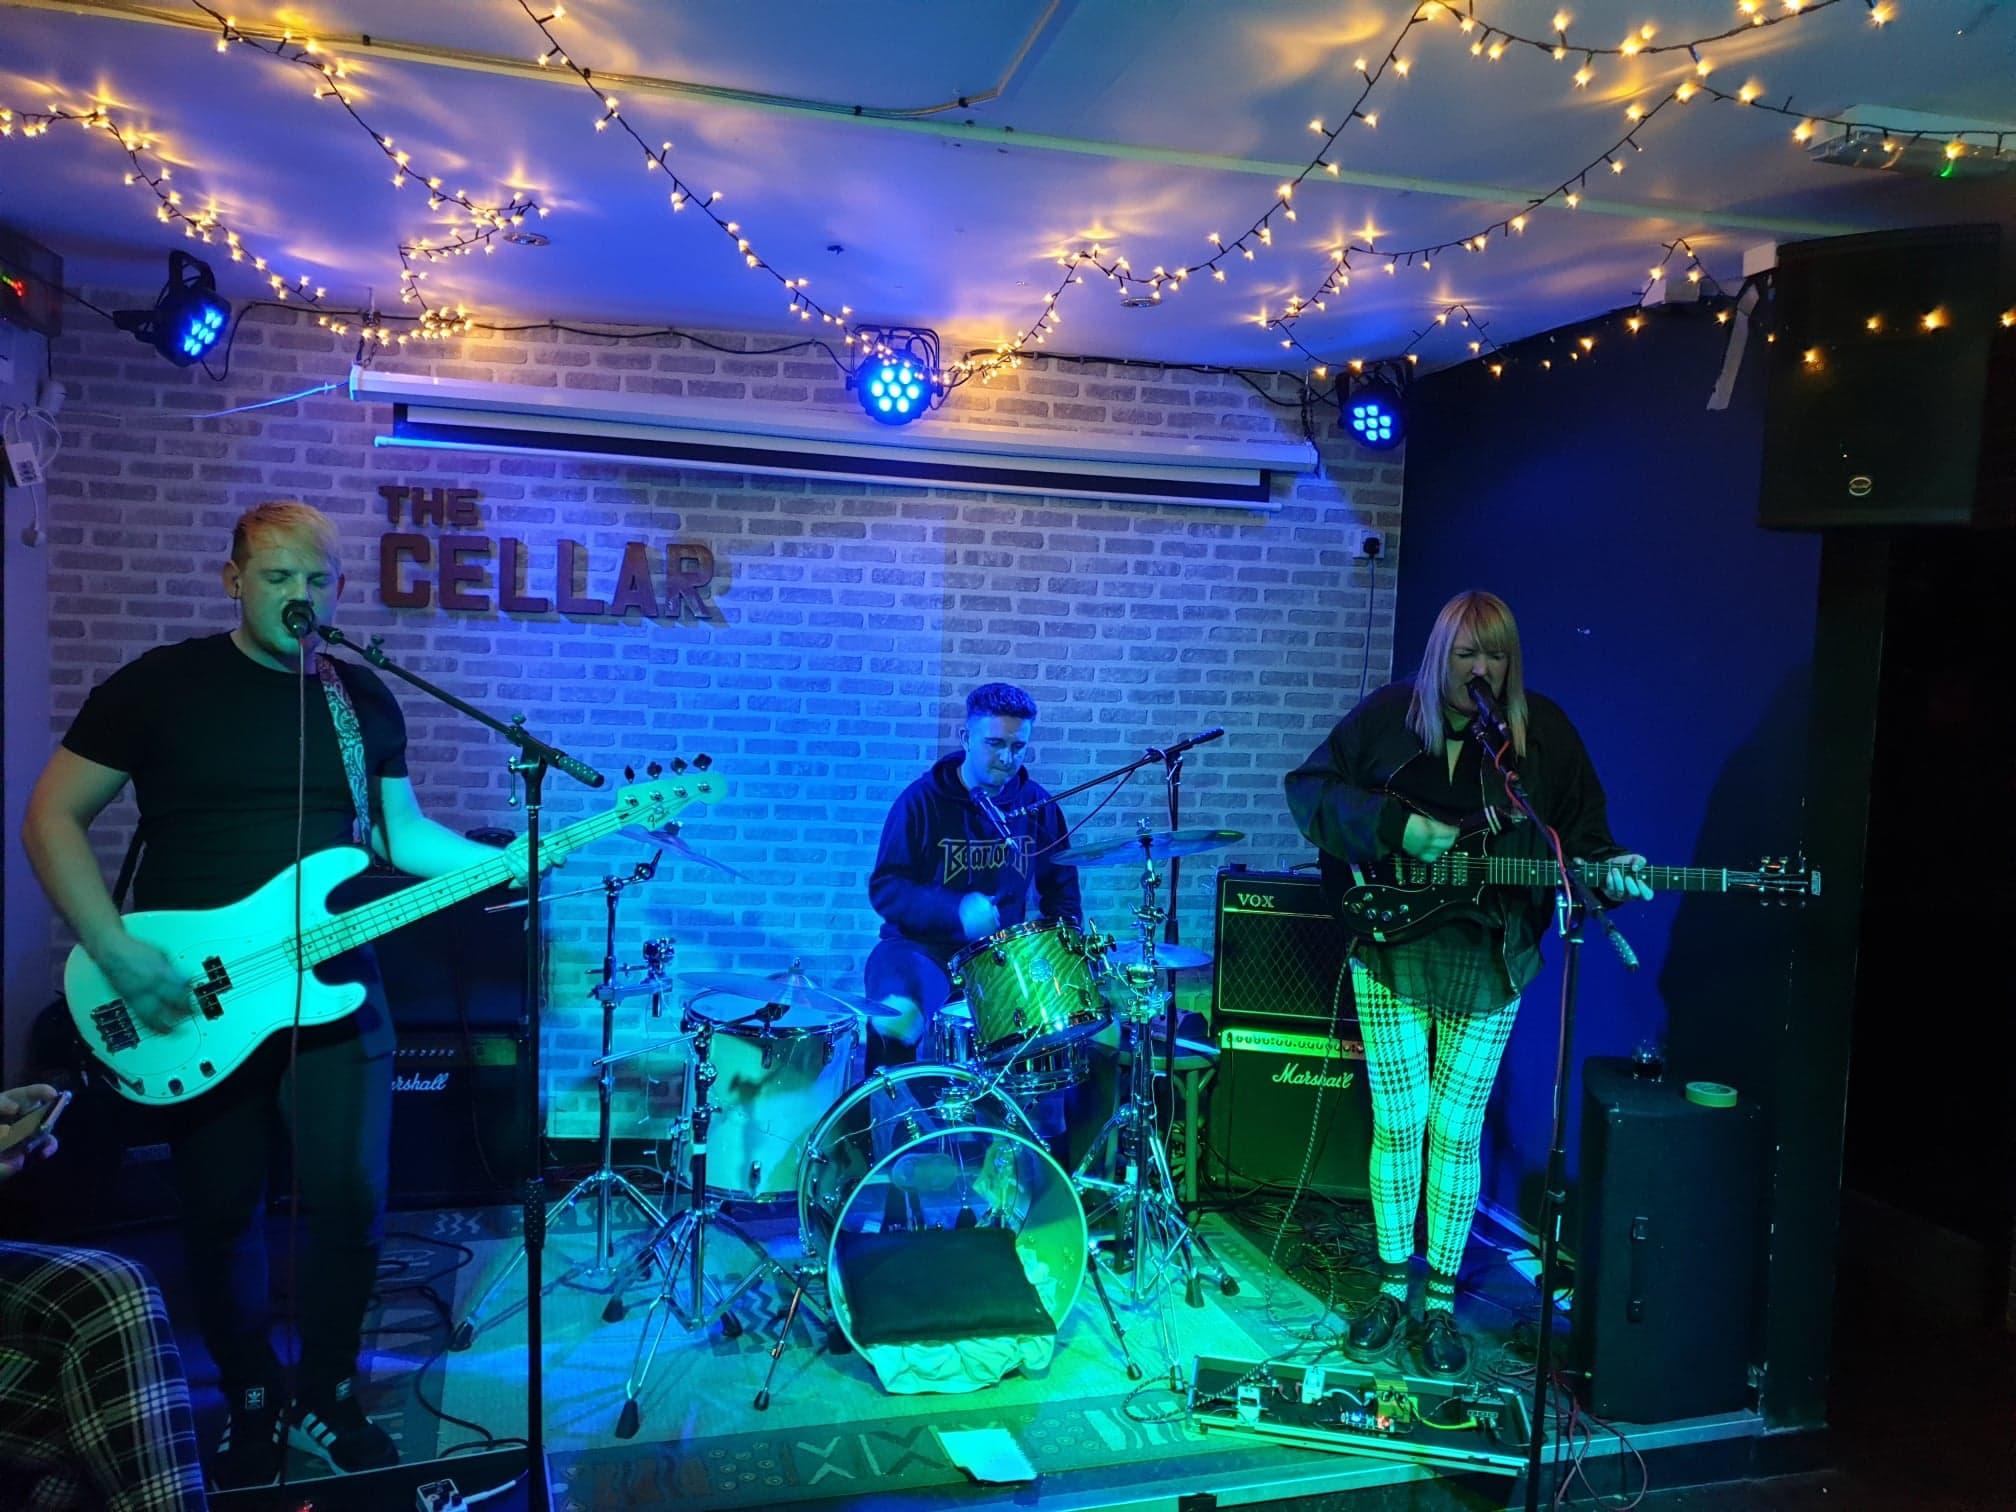 Primes performing at The Cellar